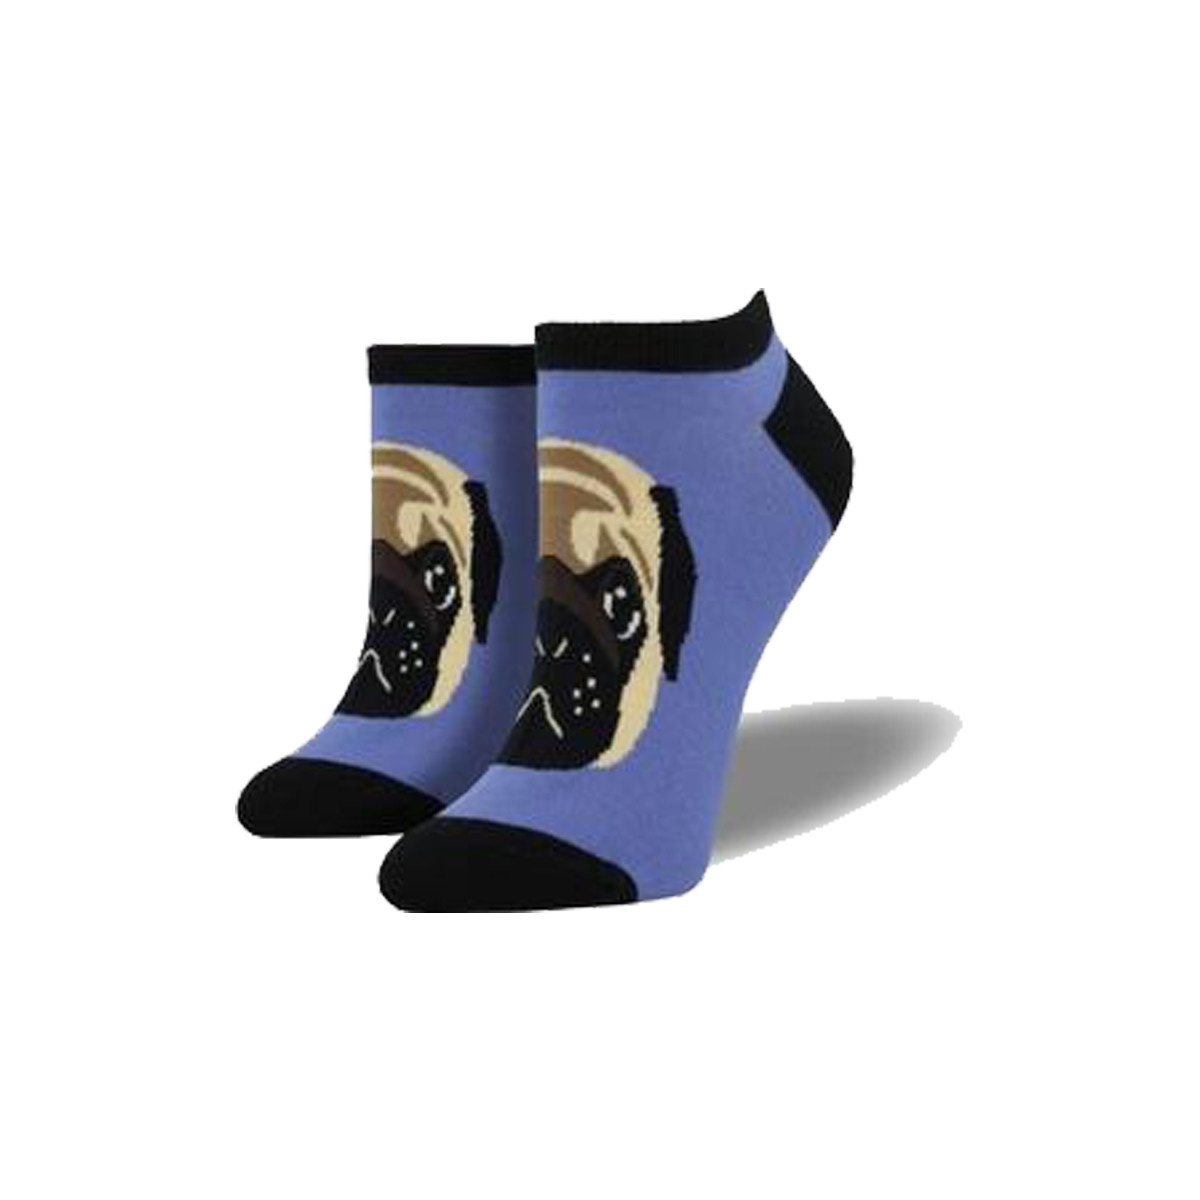 Socksmith Socksmith Women's Shortie Socks